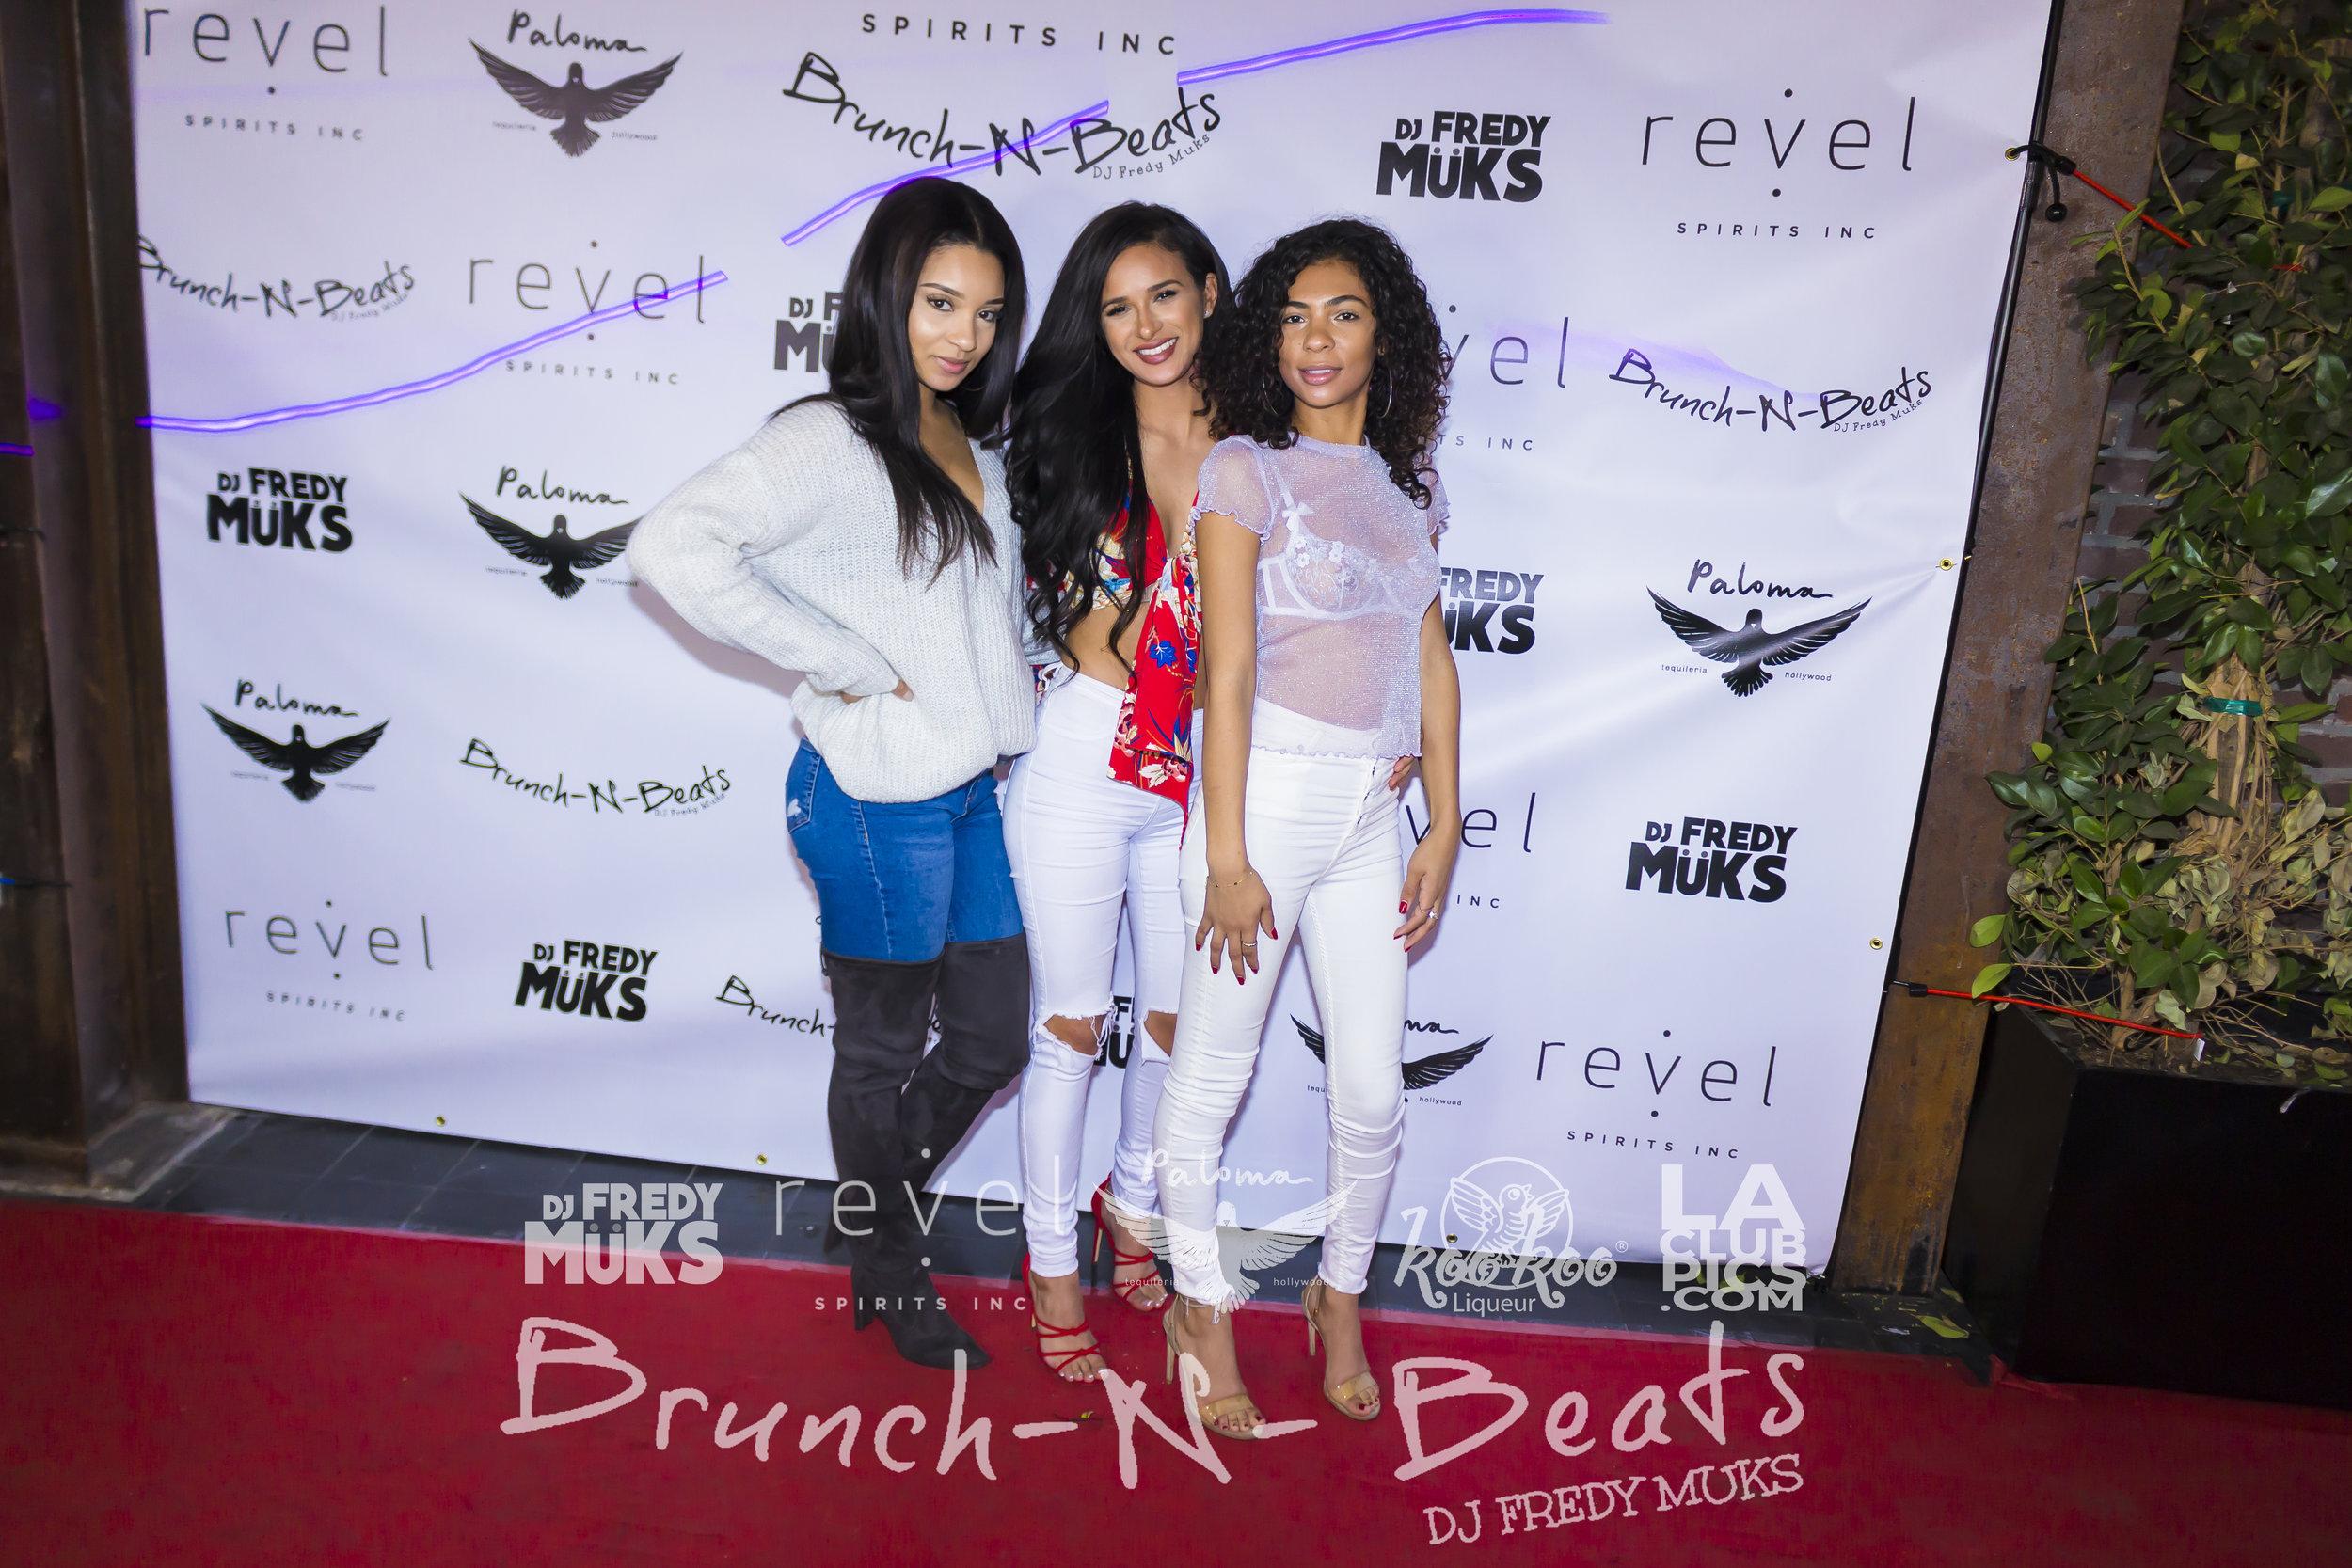 Brunch-N-Beats - Paloma Hollywood - 02-25-18_98.jpg